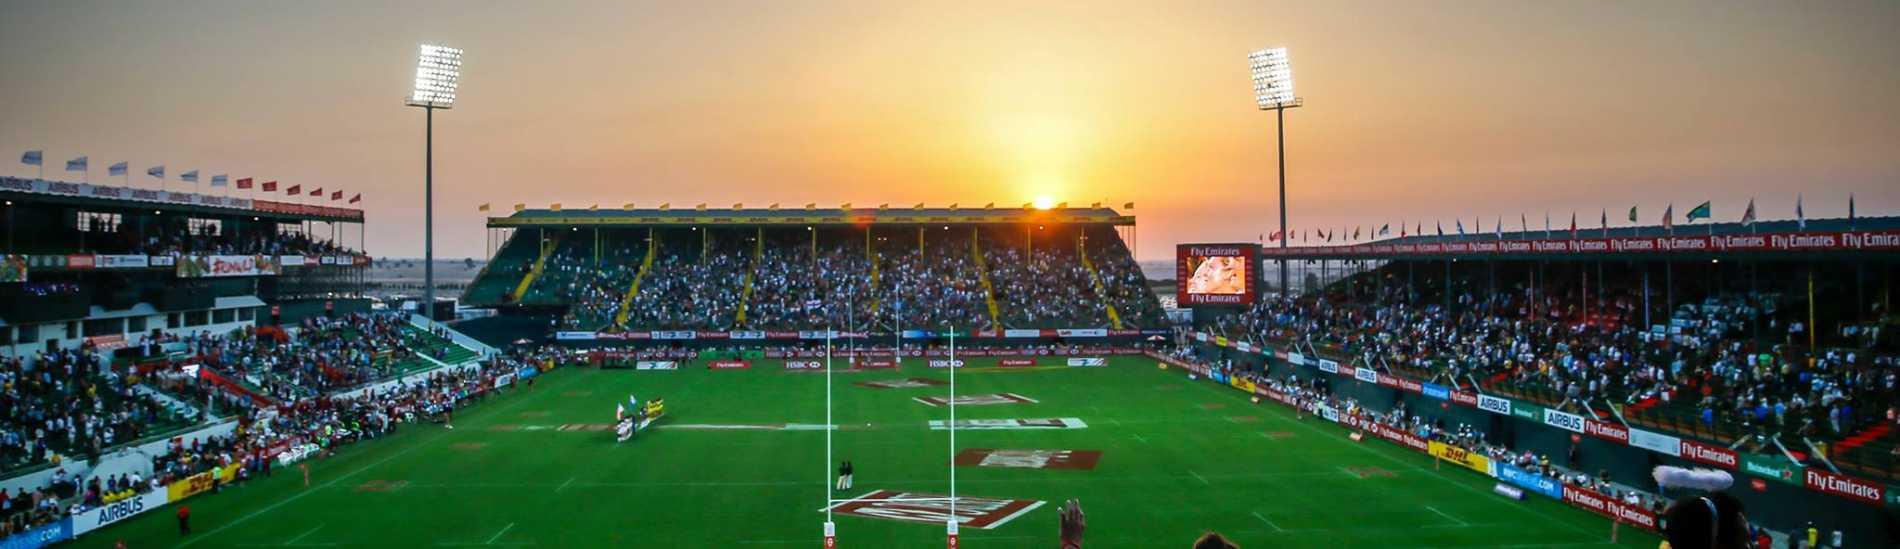 Dubai Rugby Sevens - More Than A Tournament